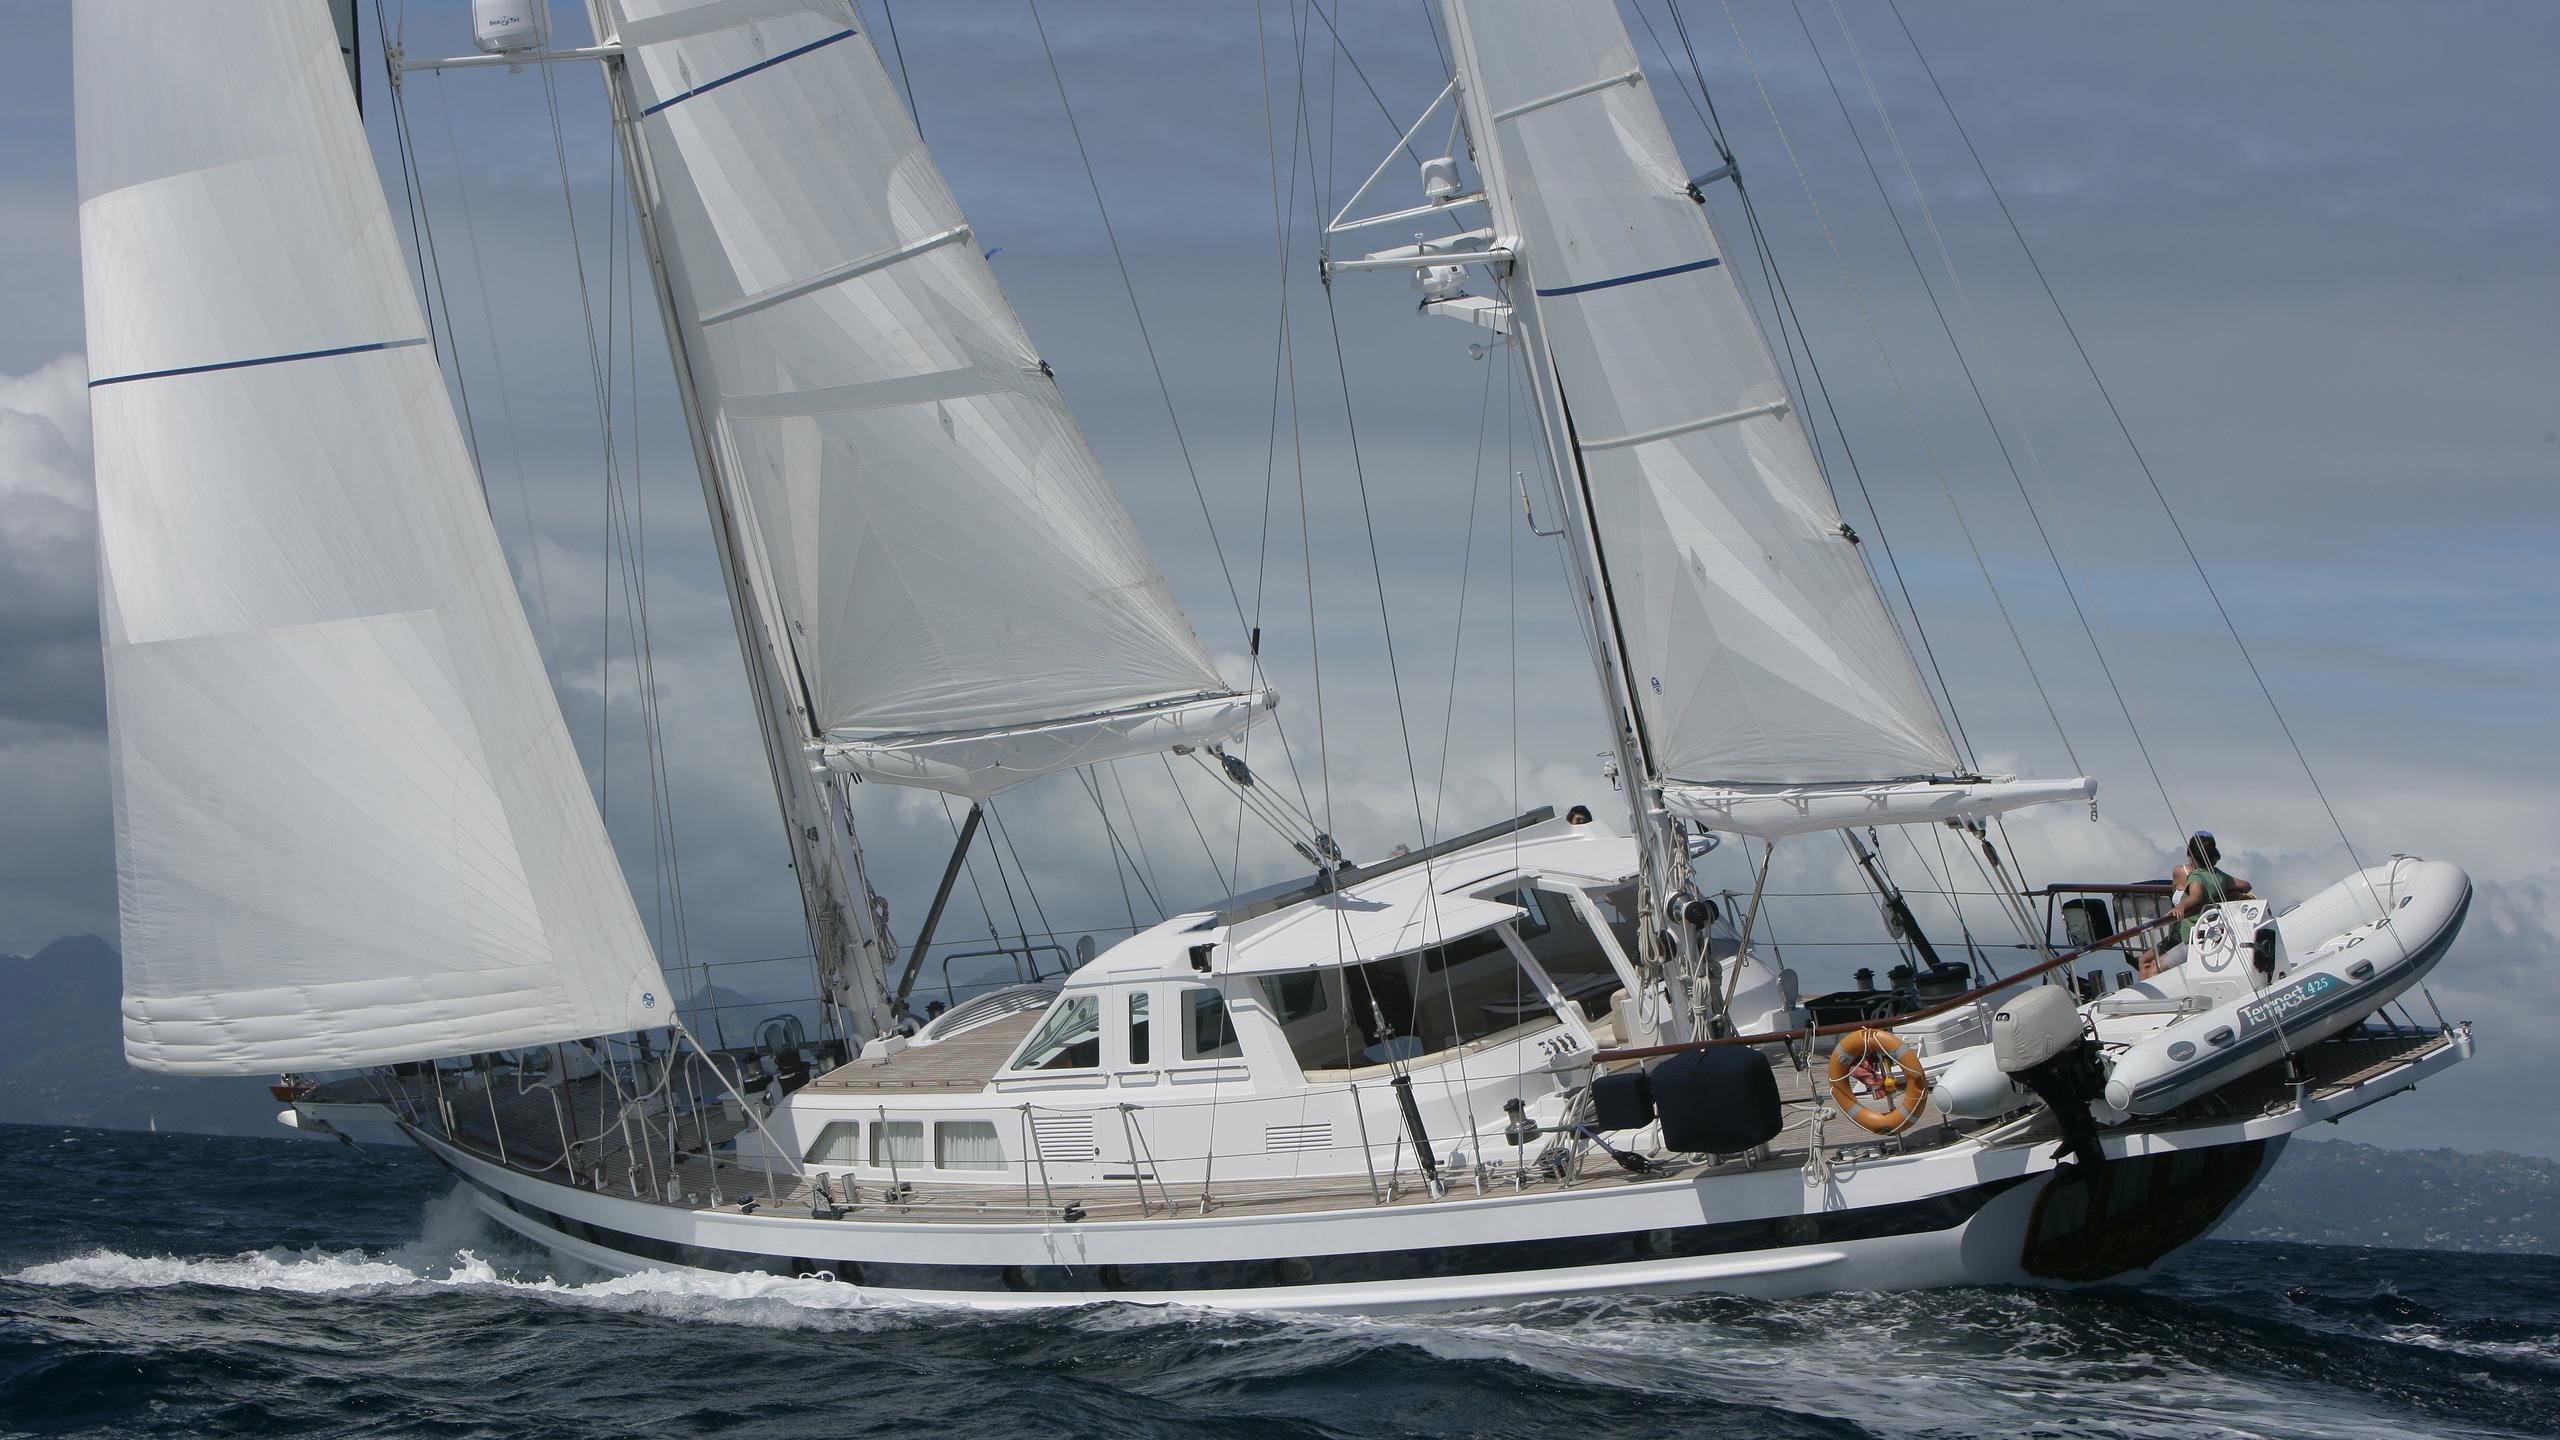 hide-n-sea-yacht-for-sale-profile